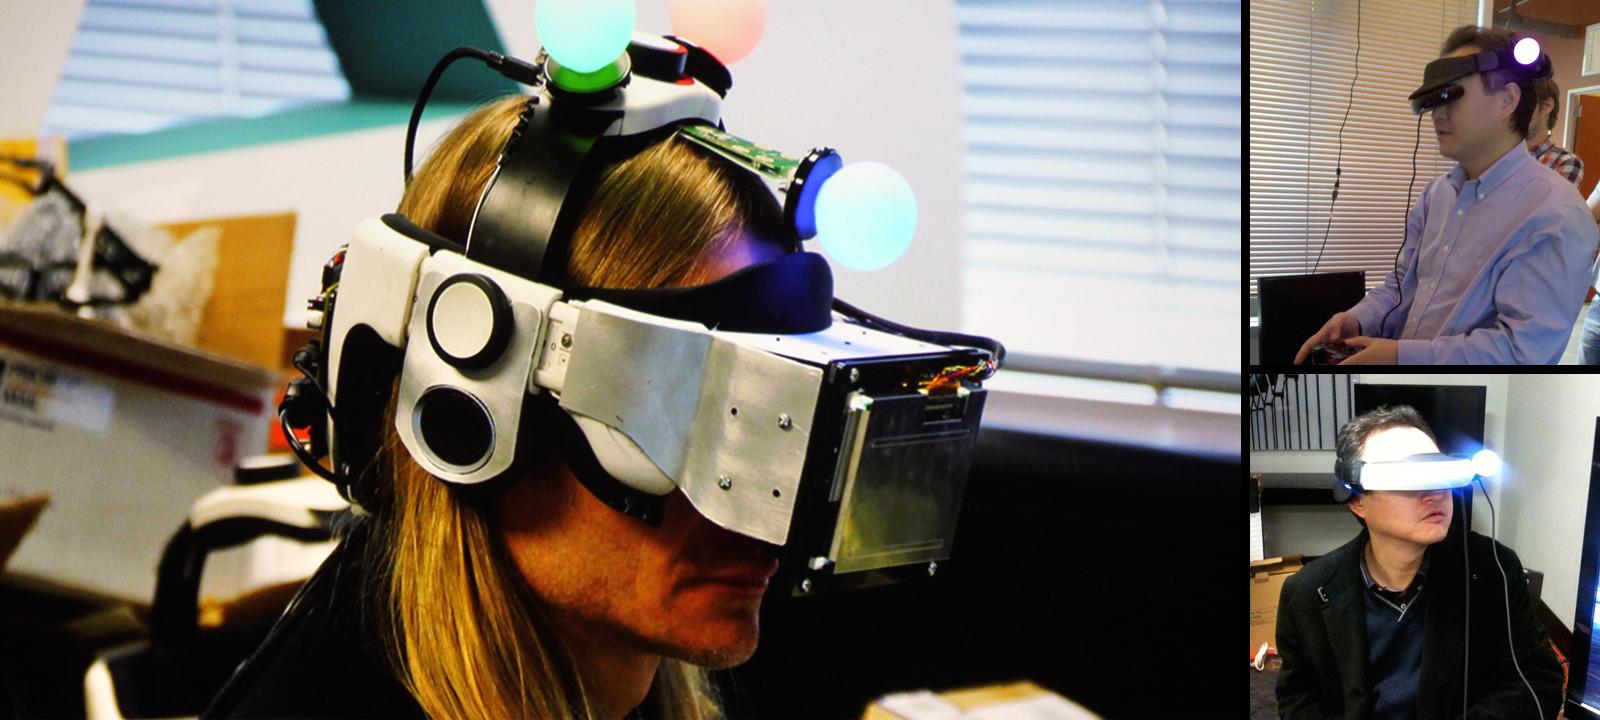 PlayStation VR prototypes